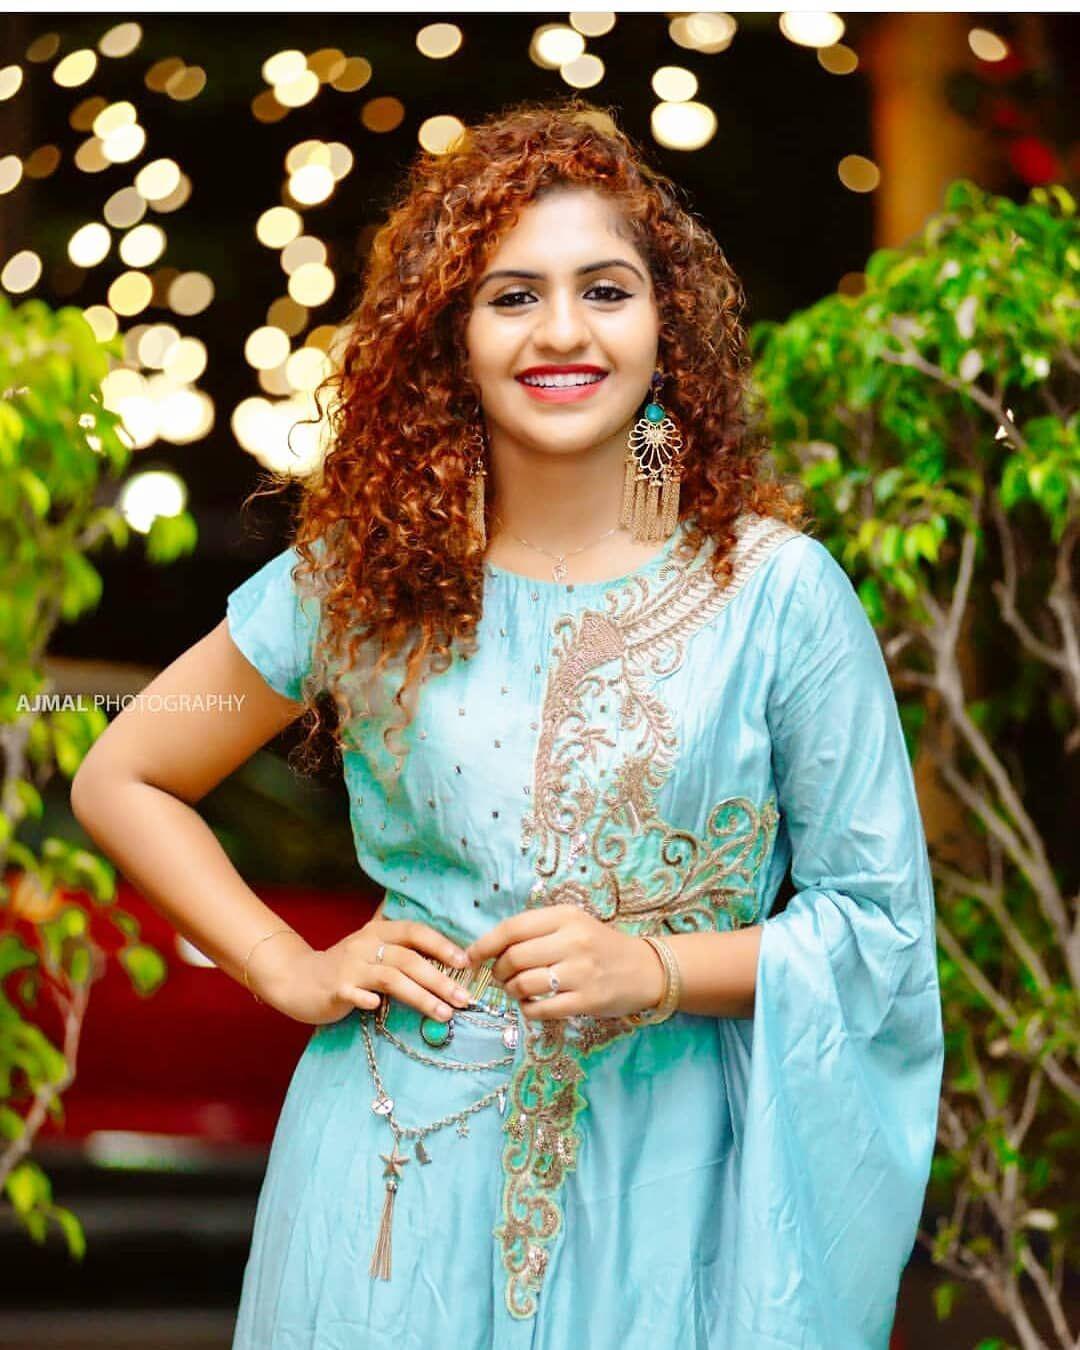 Noorine Shereef Follow Cinetimesmedia Noorin Shereef Noorinshereef Cinetimes Cine Stylish Girl Images Beautiful Indian Actress Beautiful Girl Image